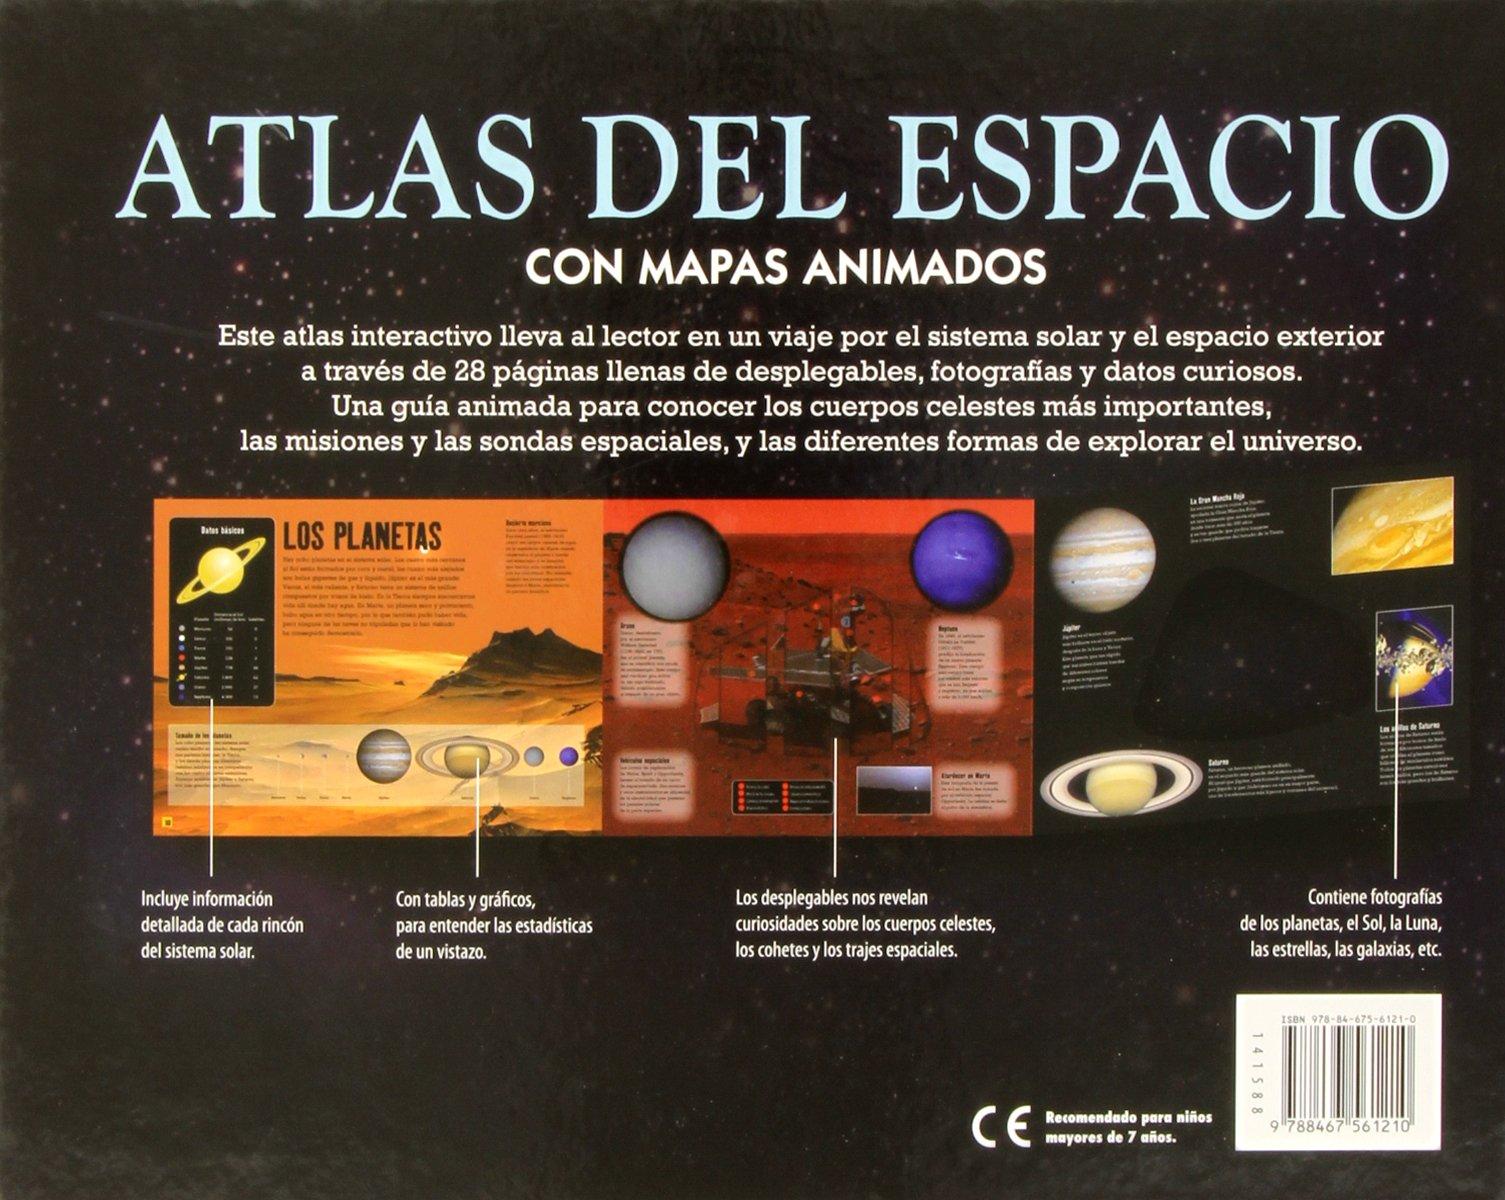 Atlas del espacio con mapas animados: I. G. Gass: 9788467561210: Amazon.com: Books